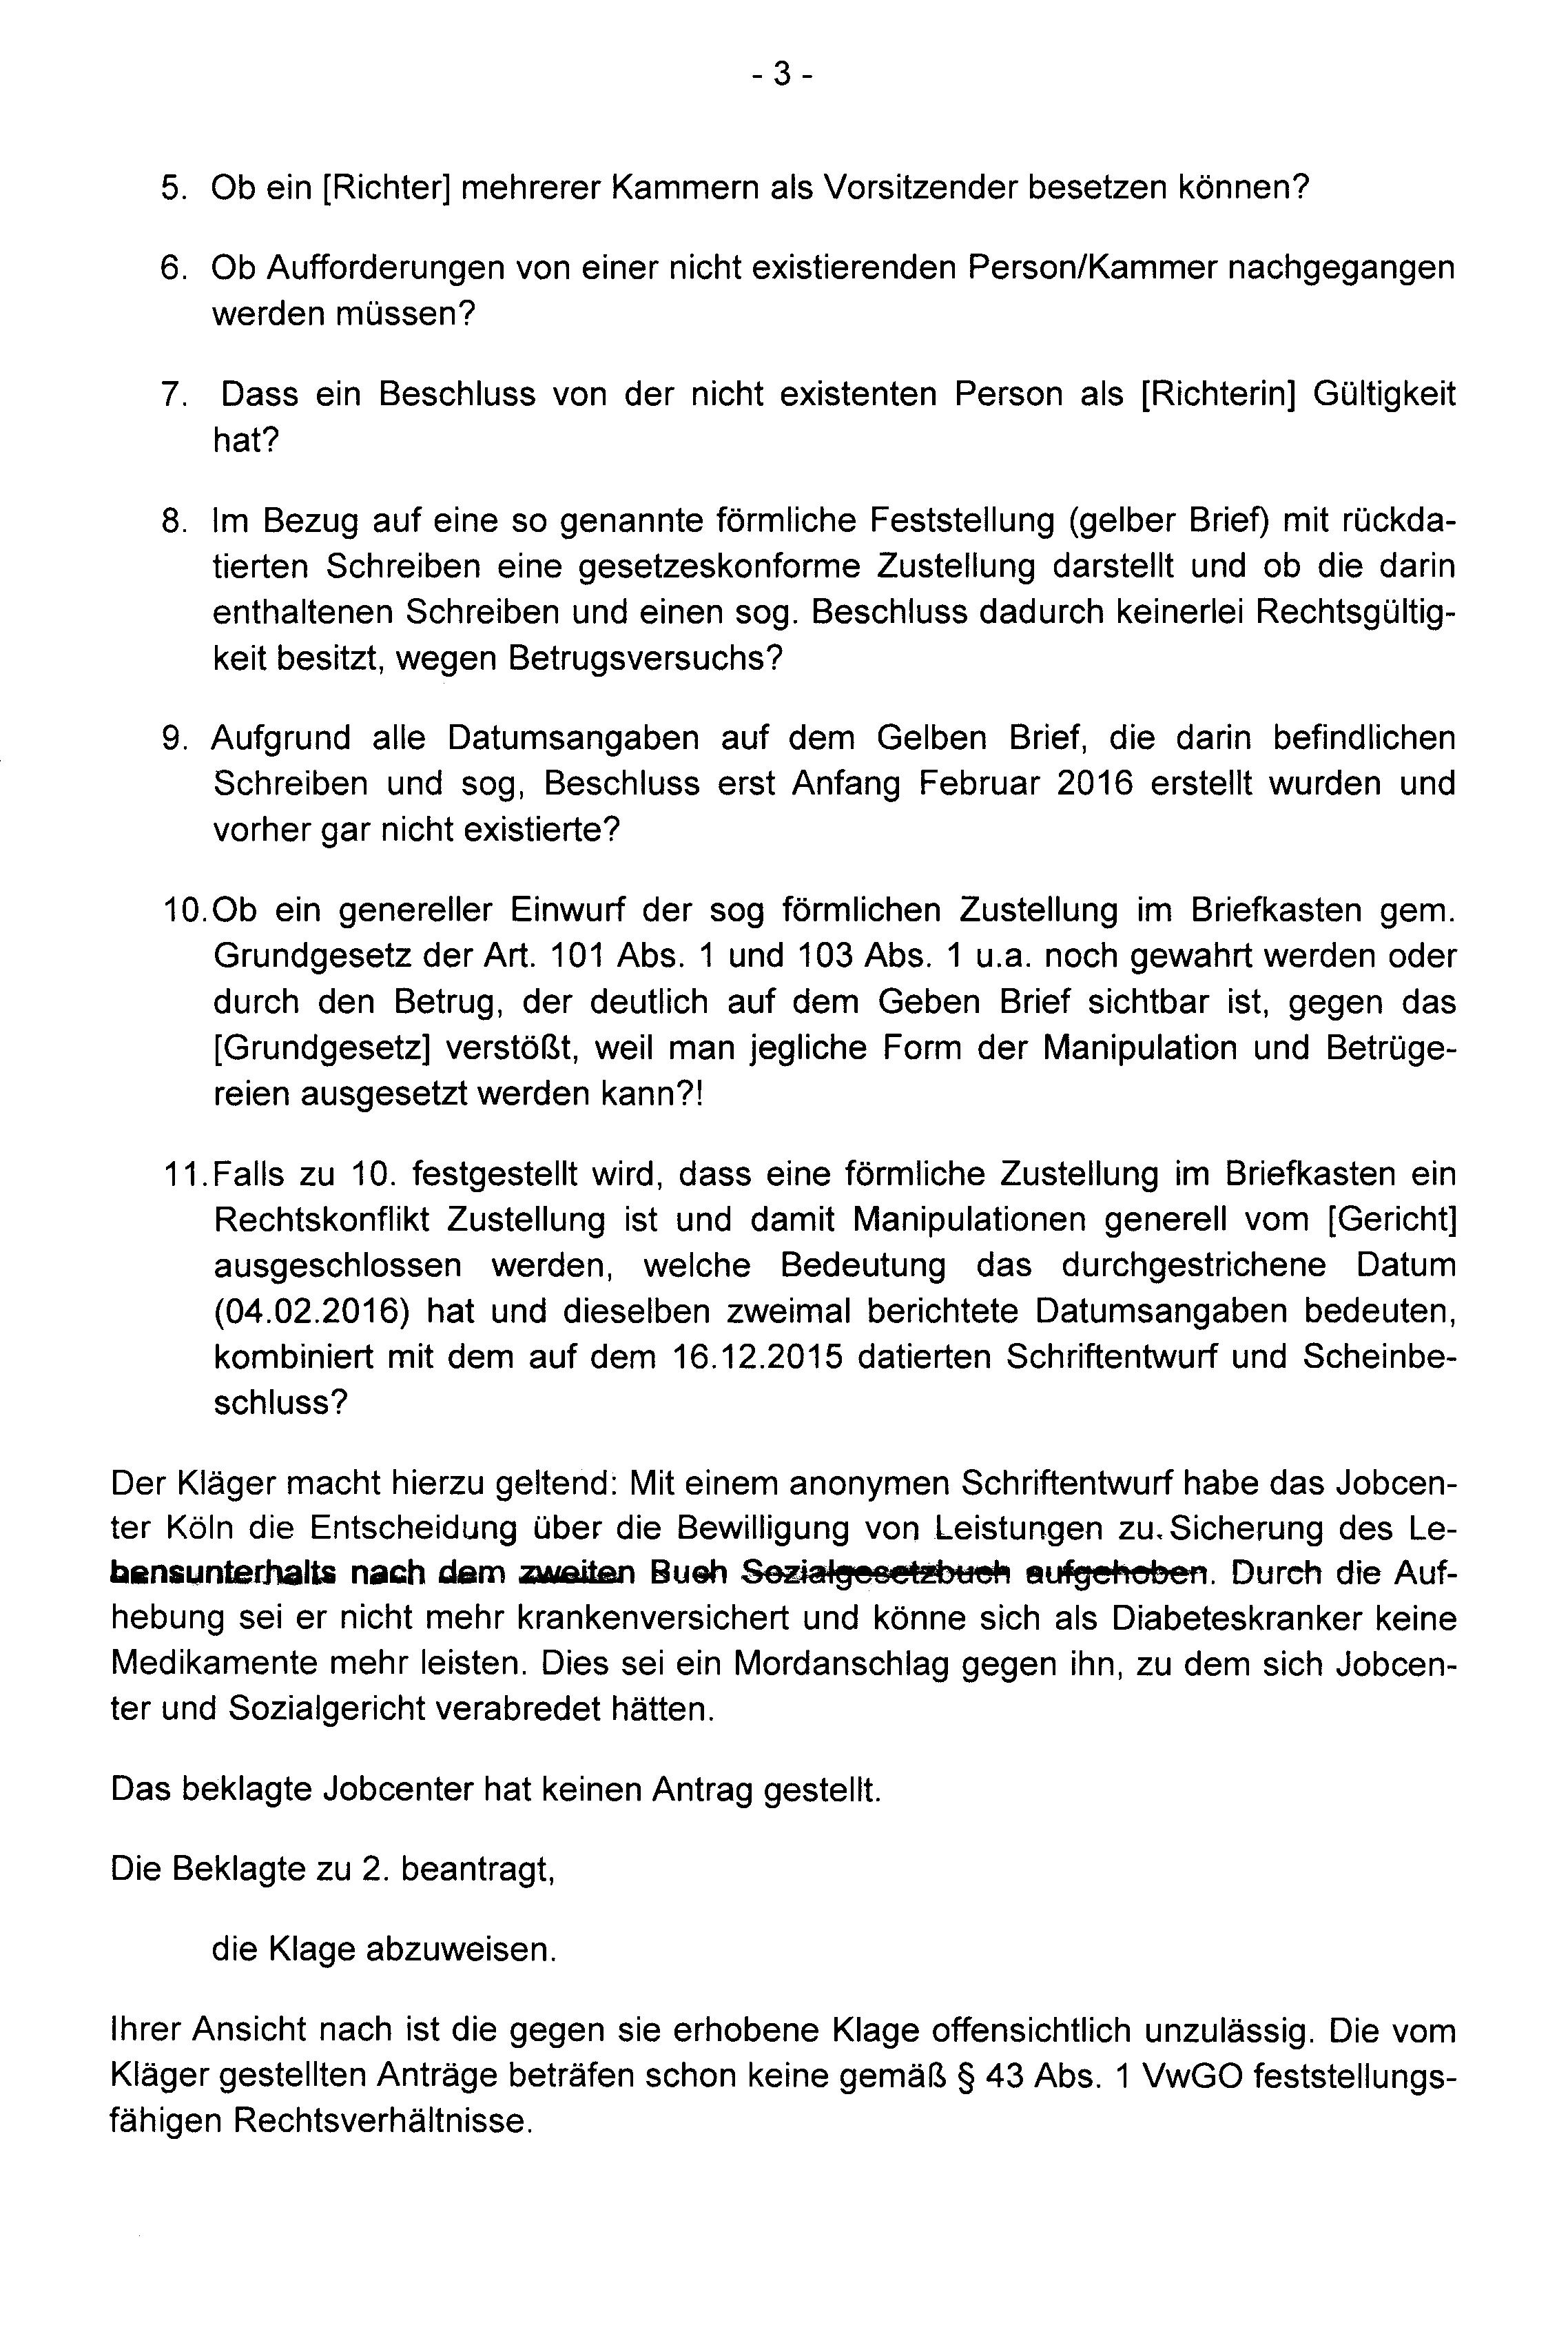 Jobcenter Mitglied Heinz Konrad Rüffer Brd Nazi Justiz Von Dj Silvan